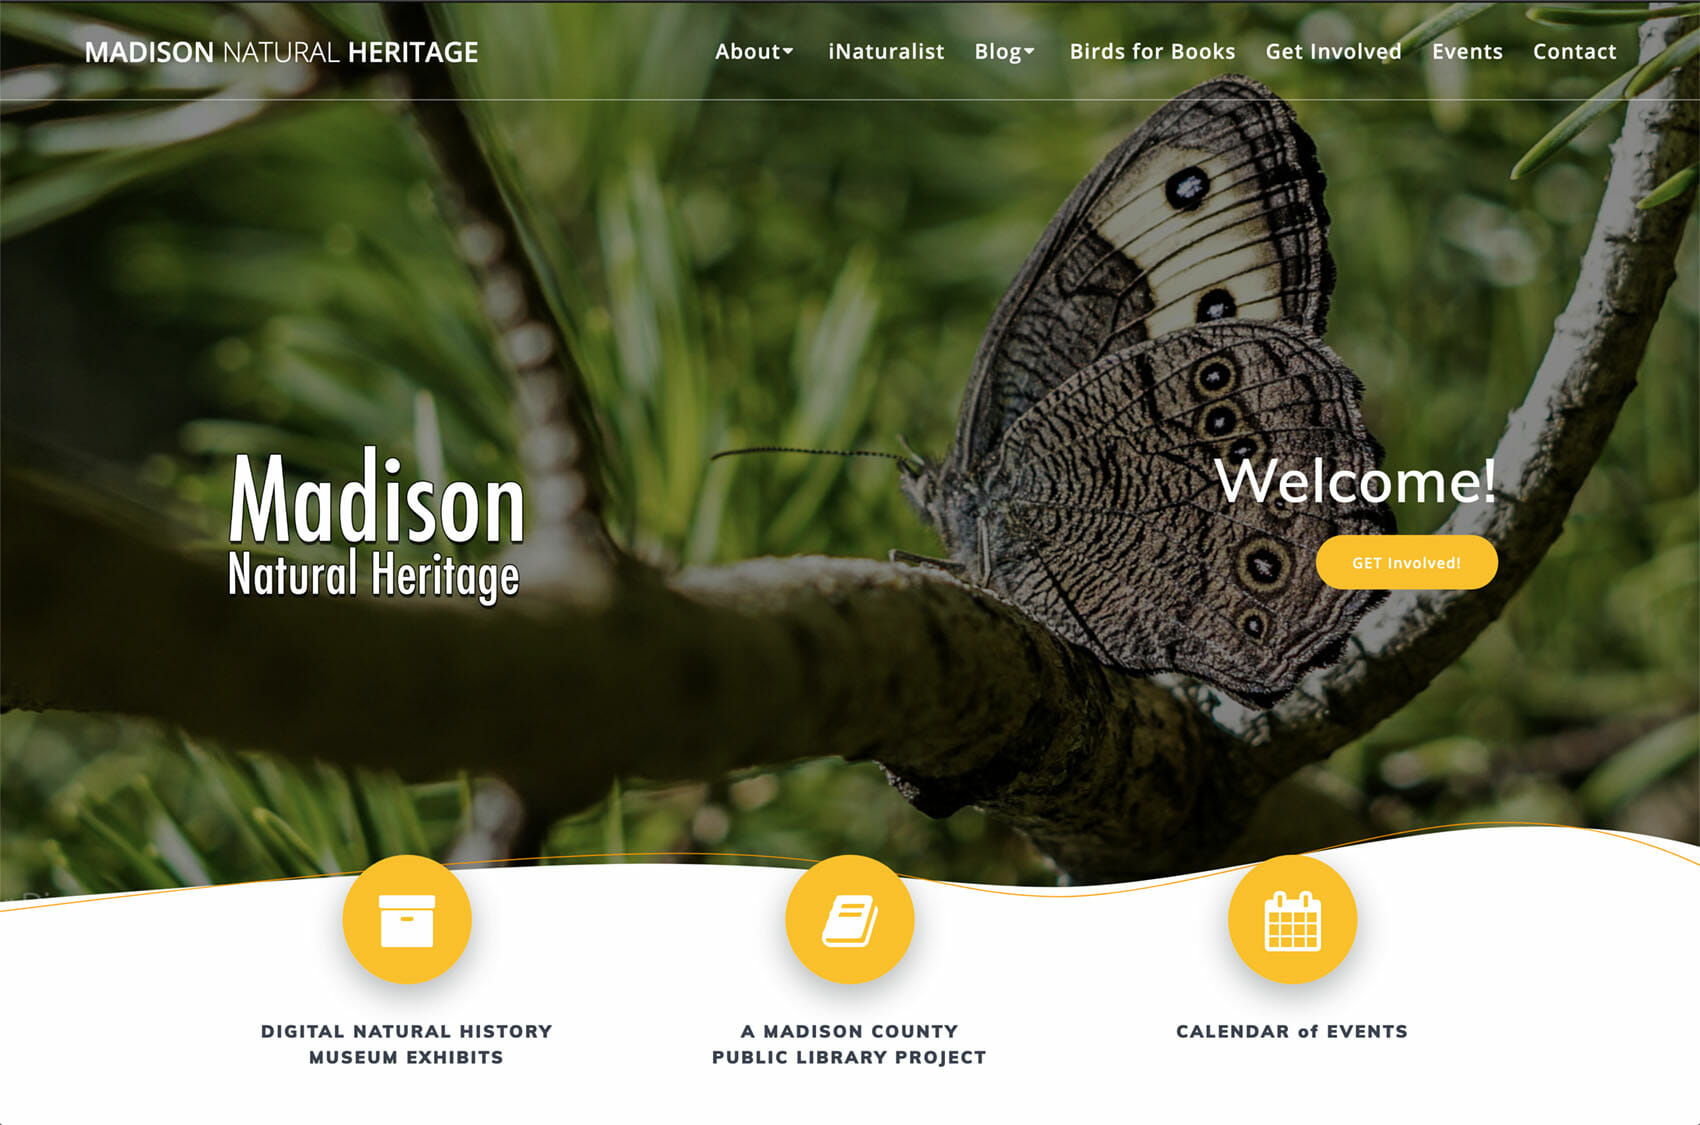 Madison Natural Heritage